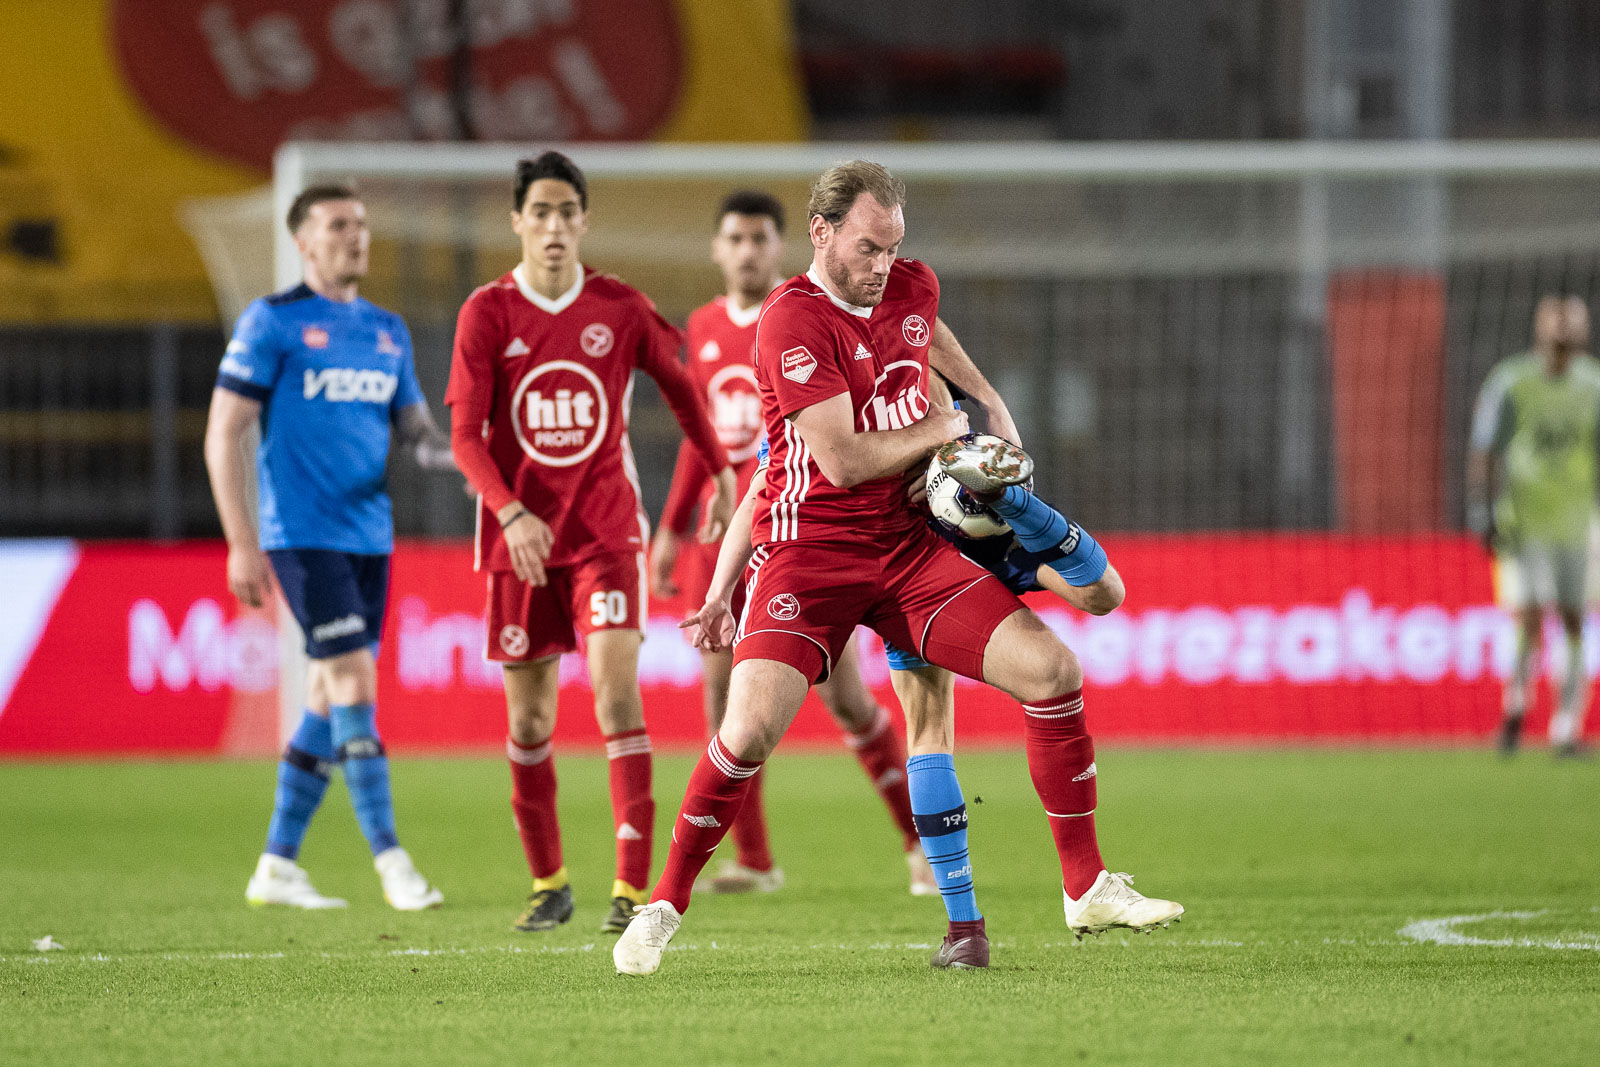 Vossebelt: 'Vol vertrouwen en topfit play-offs in'